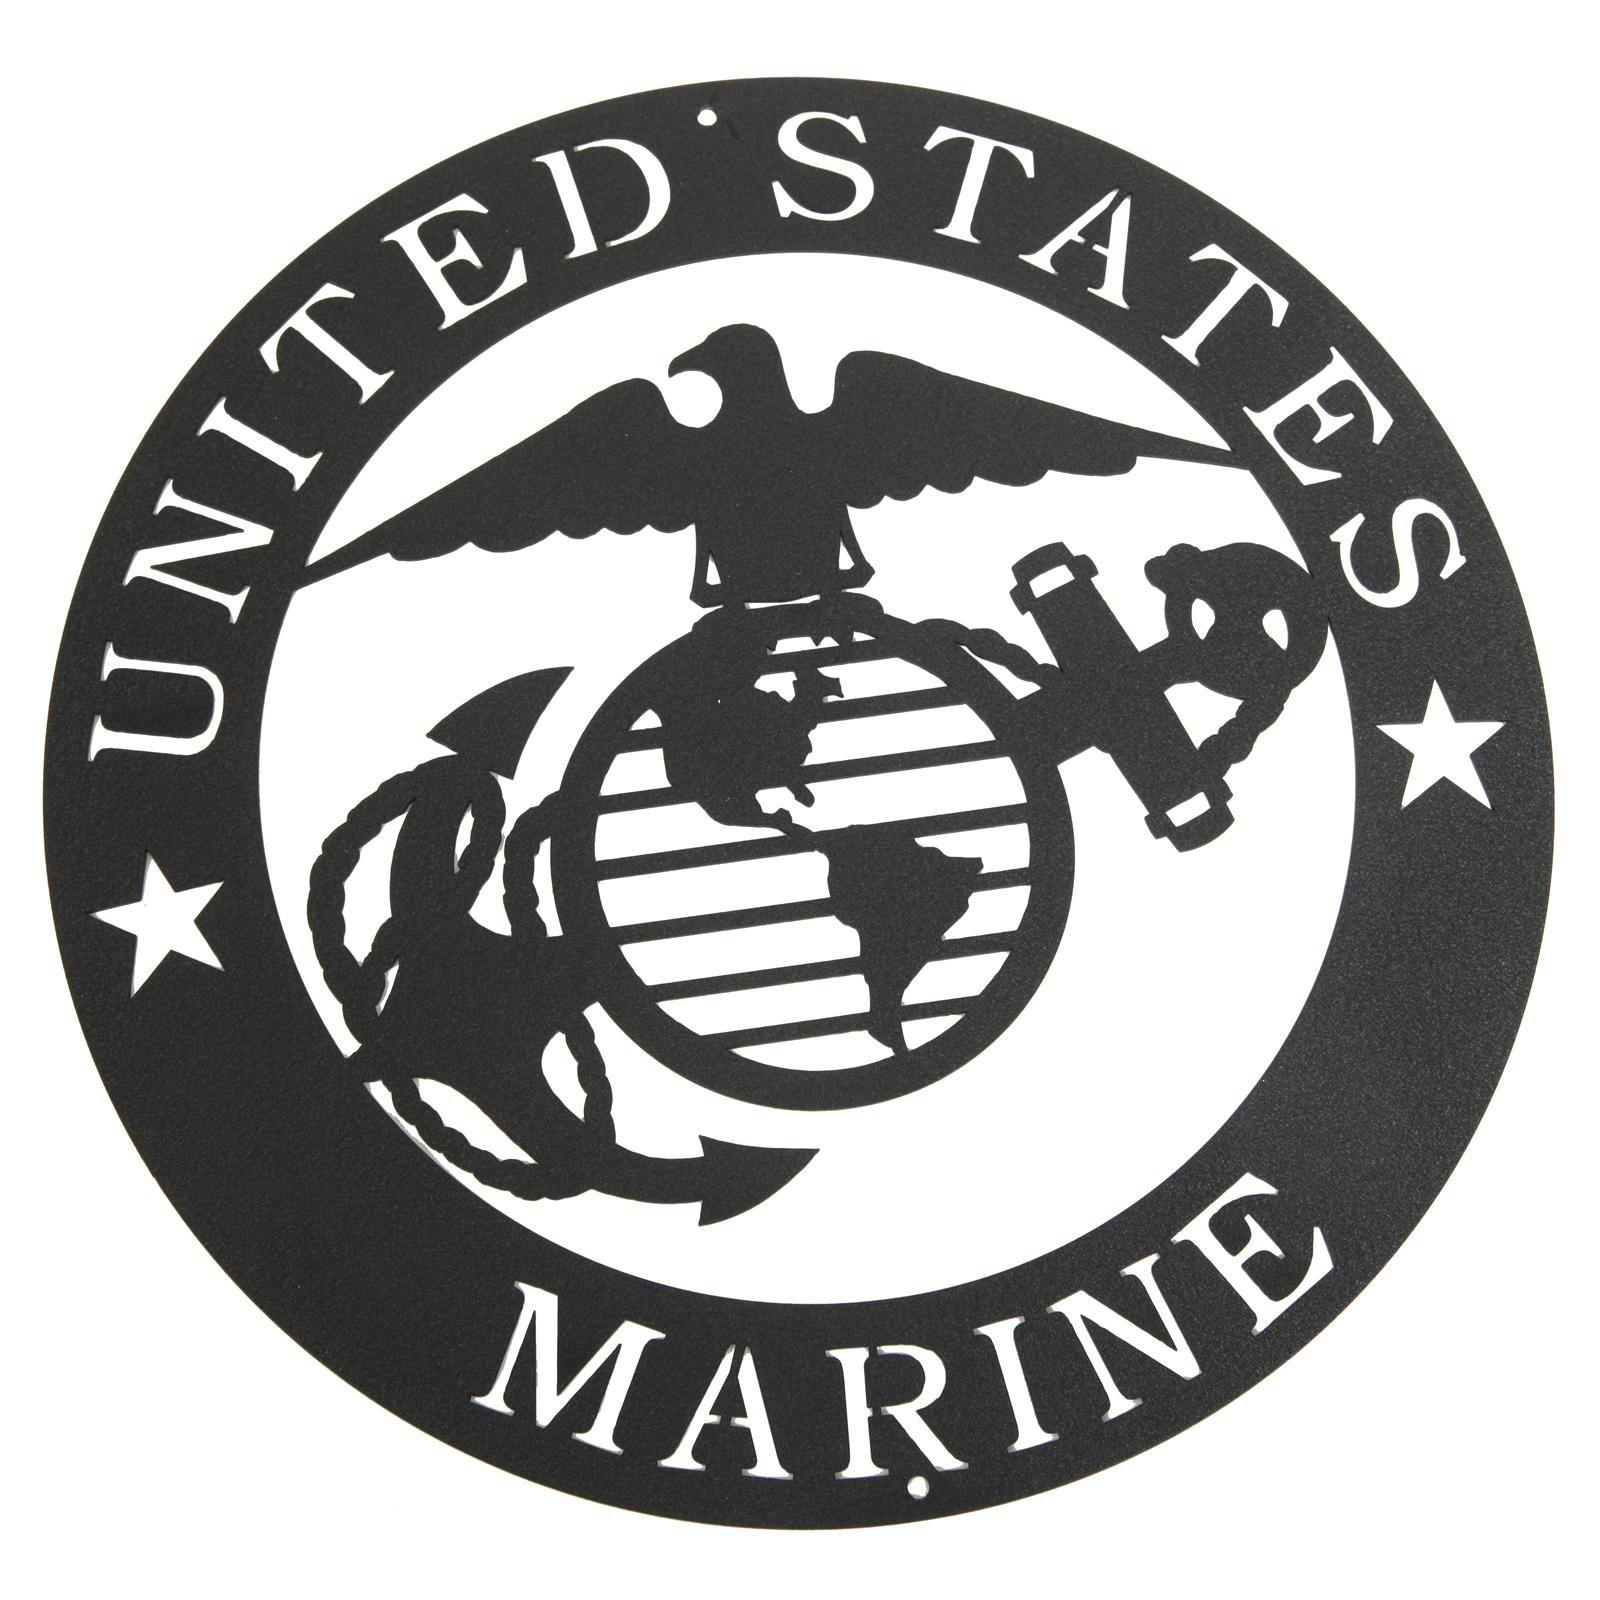 Marines Corps Emblem Metal Silhouette Marine corps